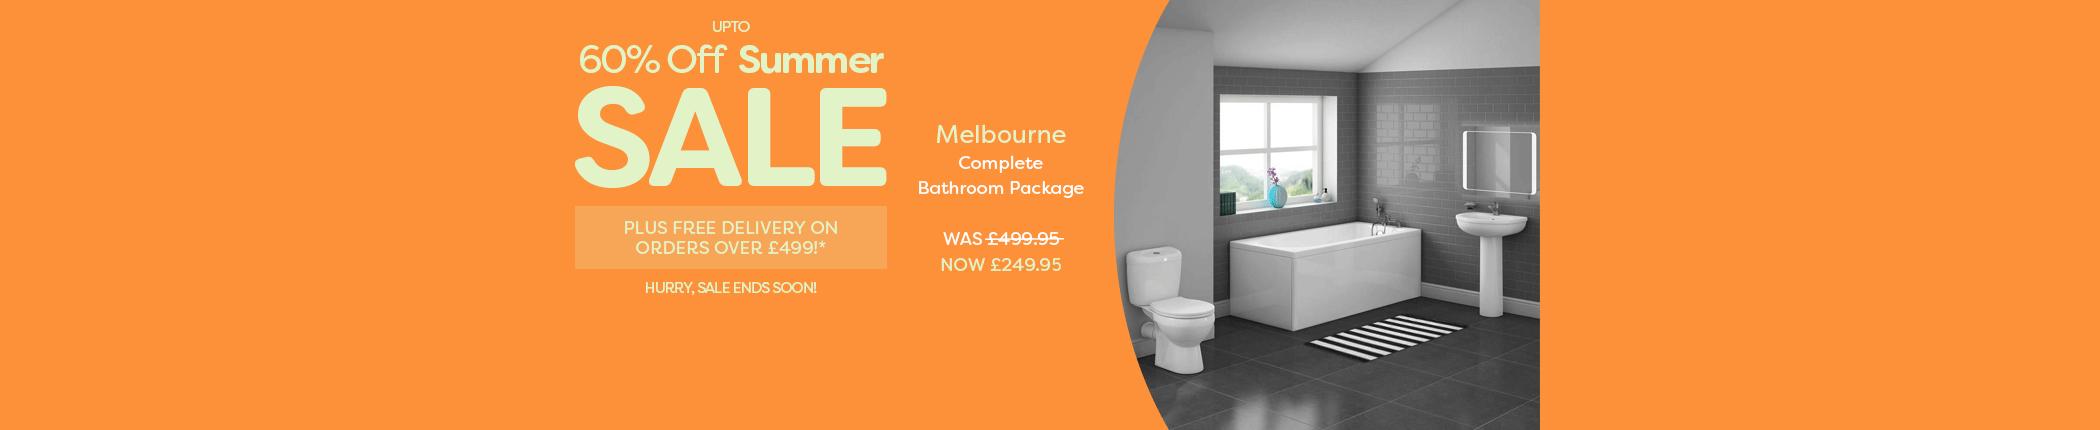 summer-sale-melbourne-complete-bathroom-package-countdown-july17-hbnr